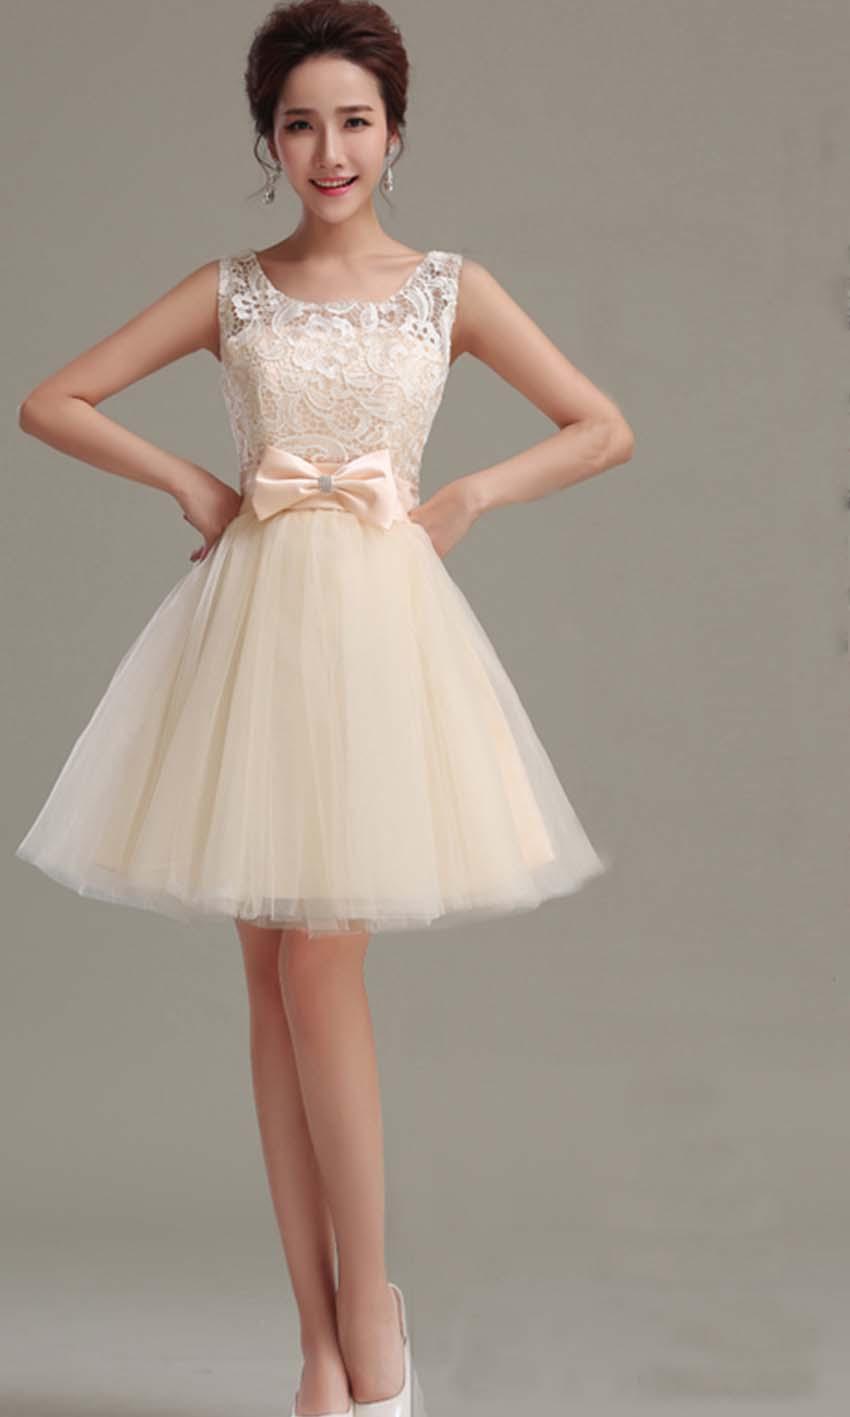 785abf84c06 Cute Prom Dresses Ball Gown - Data Dynamic AG